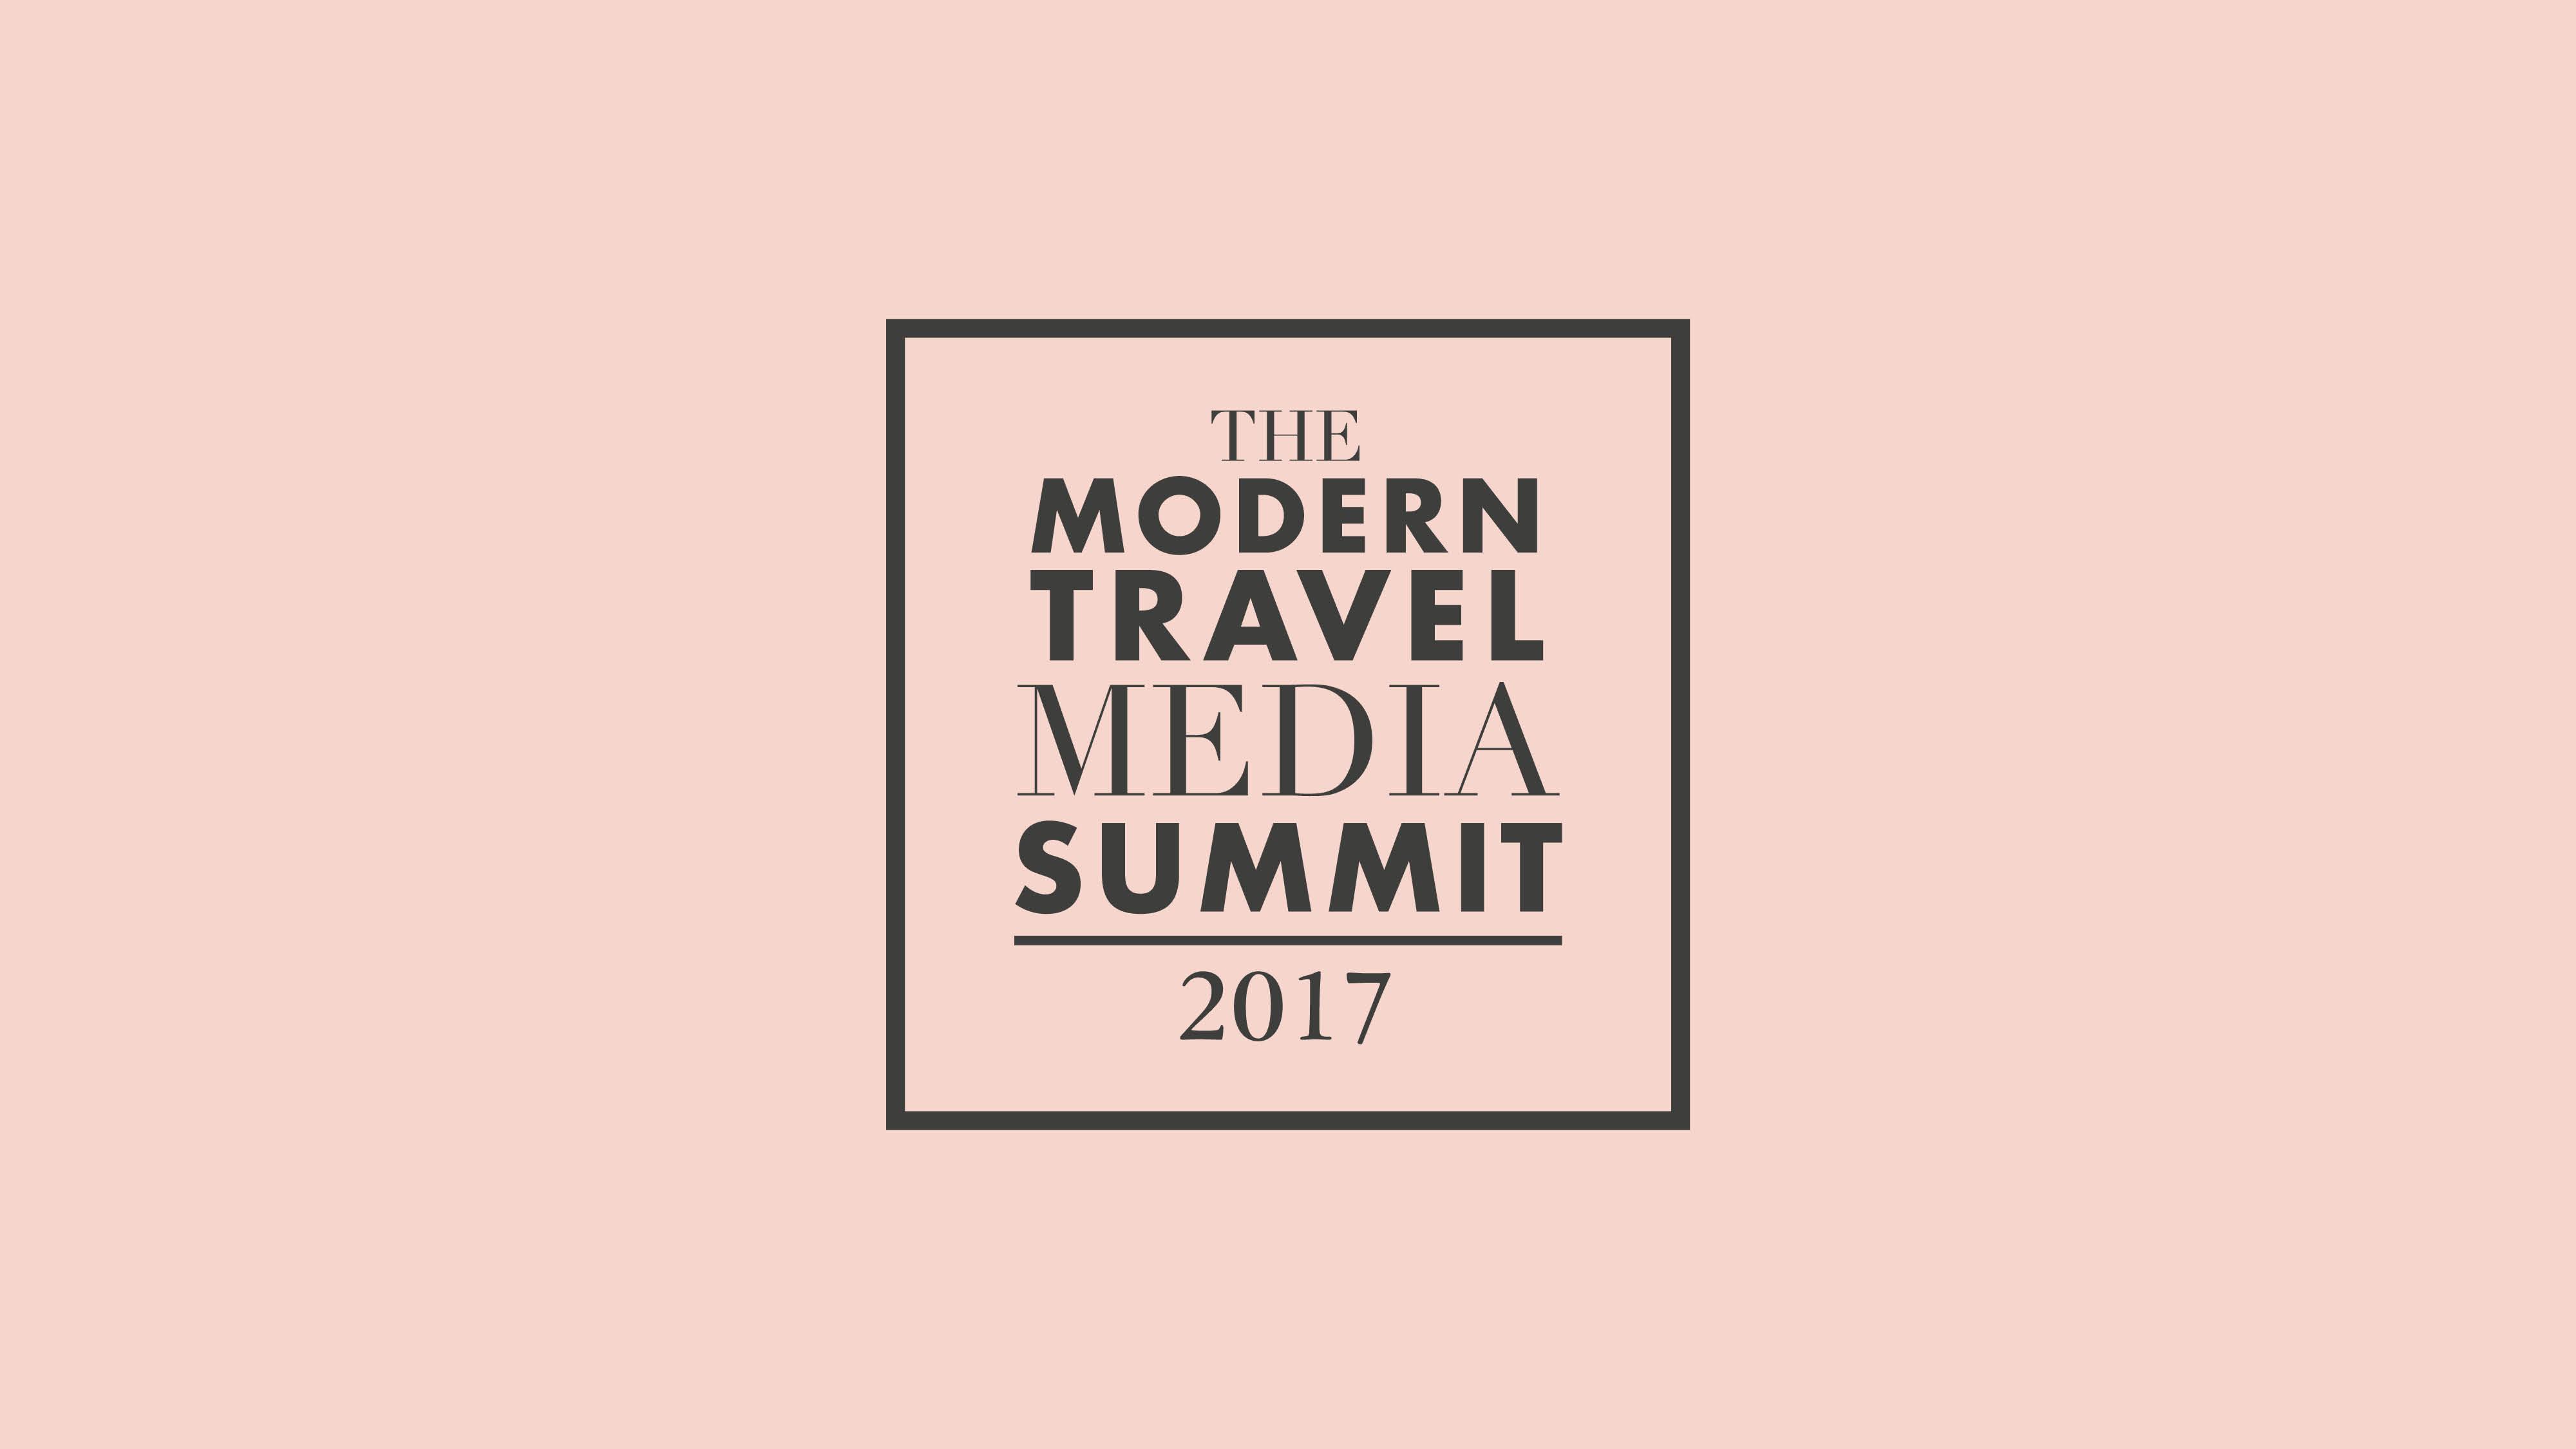 The Modern Travel Media Summit 2017 logo